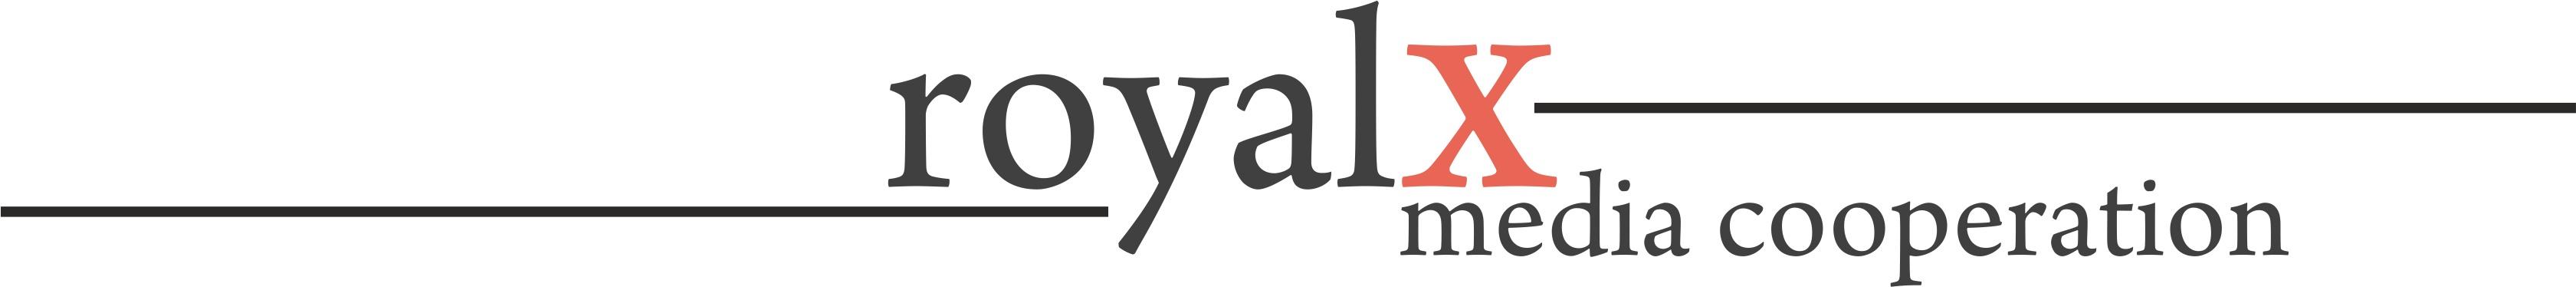 royalX media cooperation